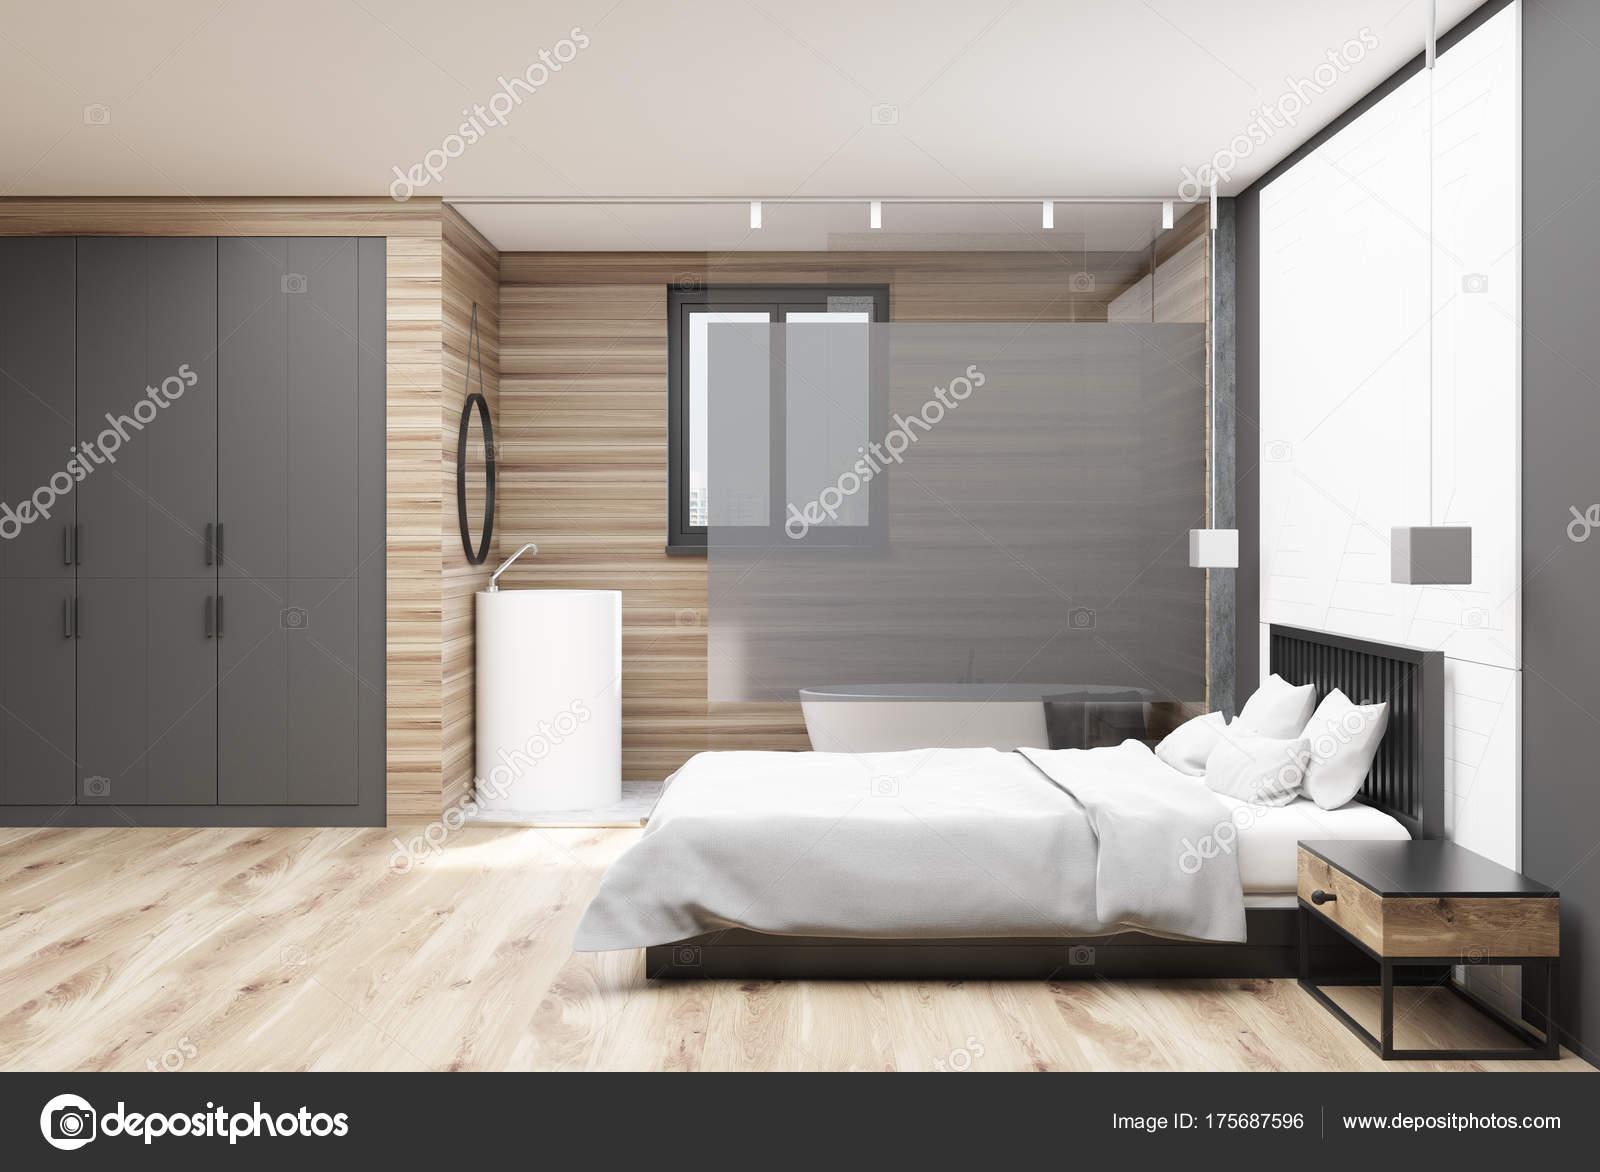 Badkamer Met Hout : Badkamer ideeen hout house design